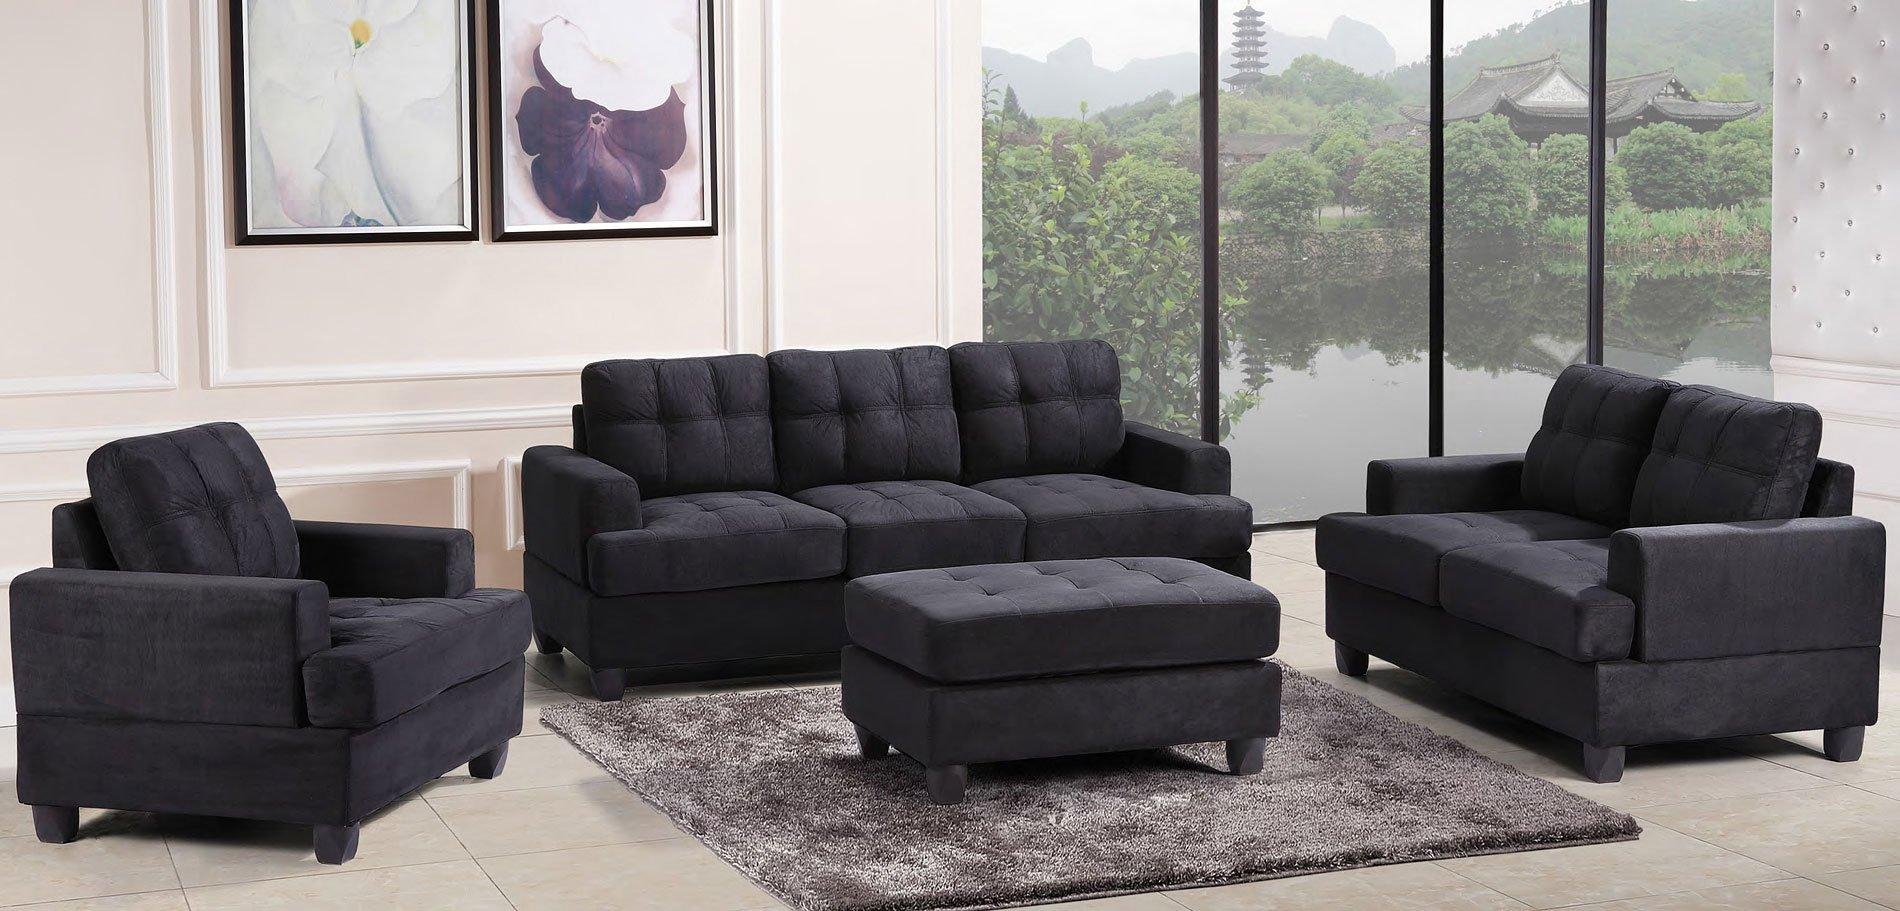 G515 Living Room Set (Black)